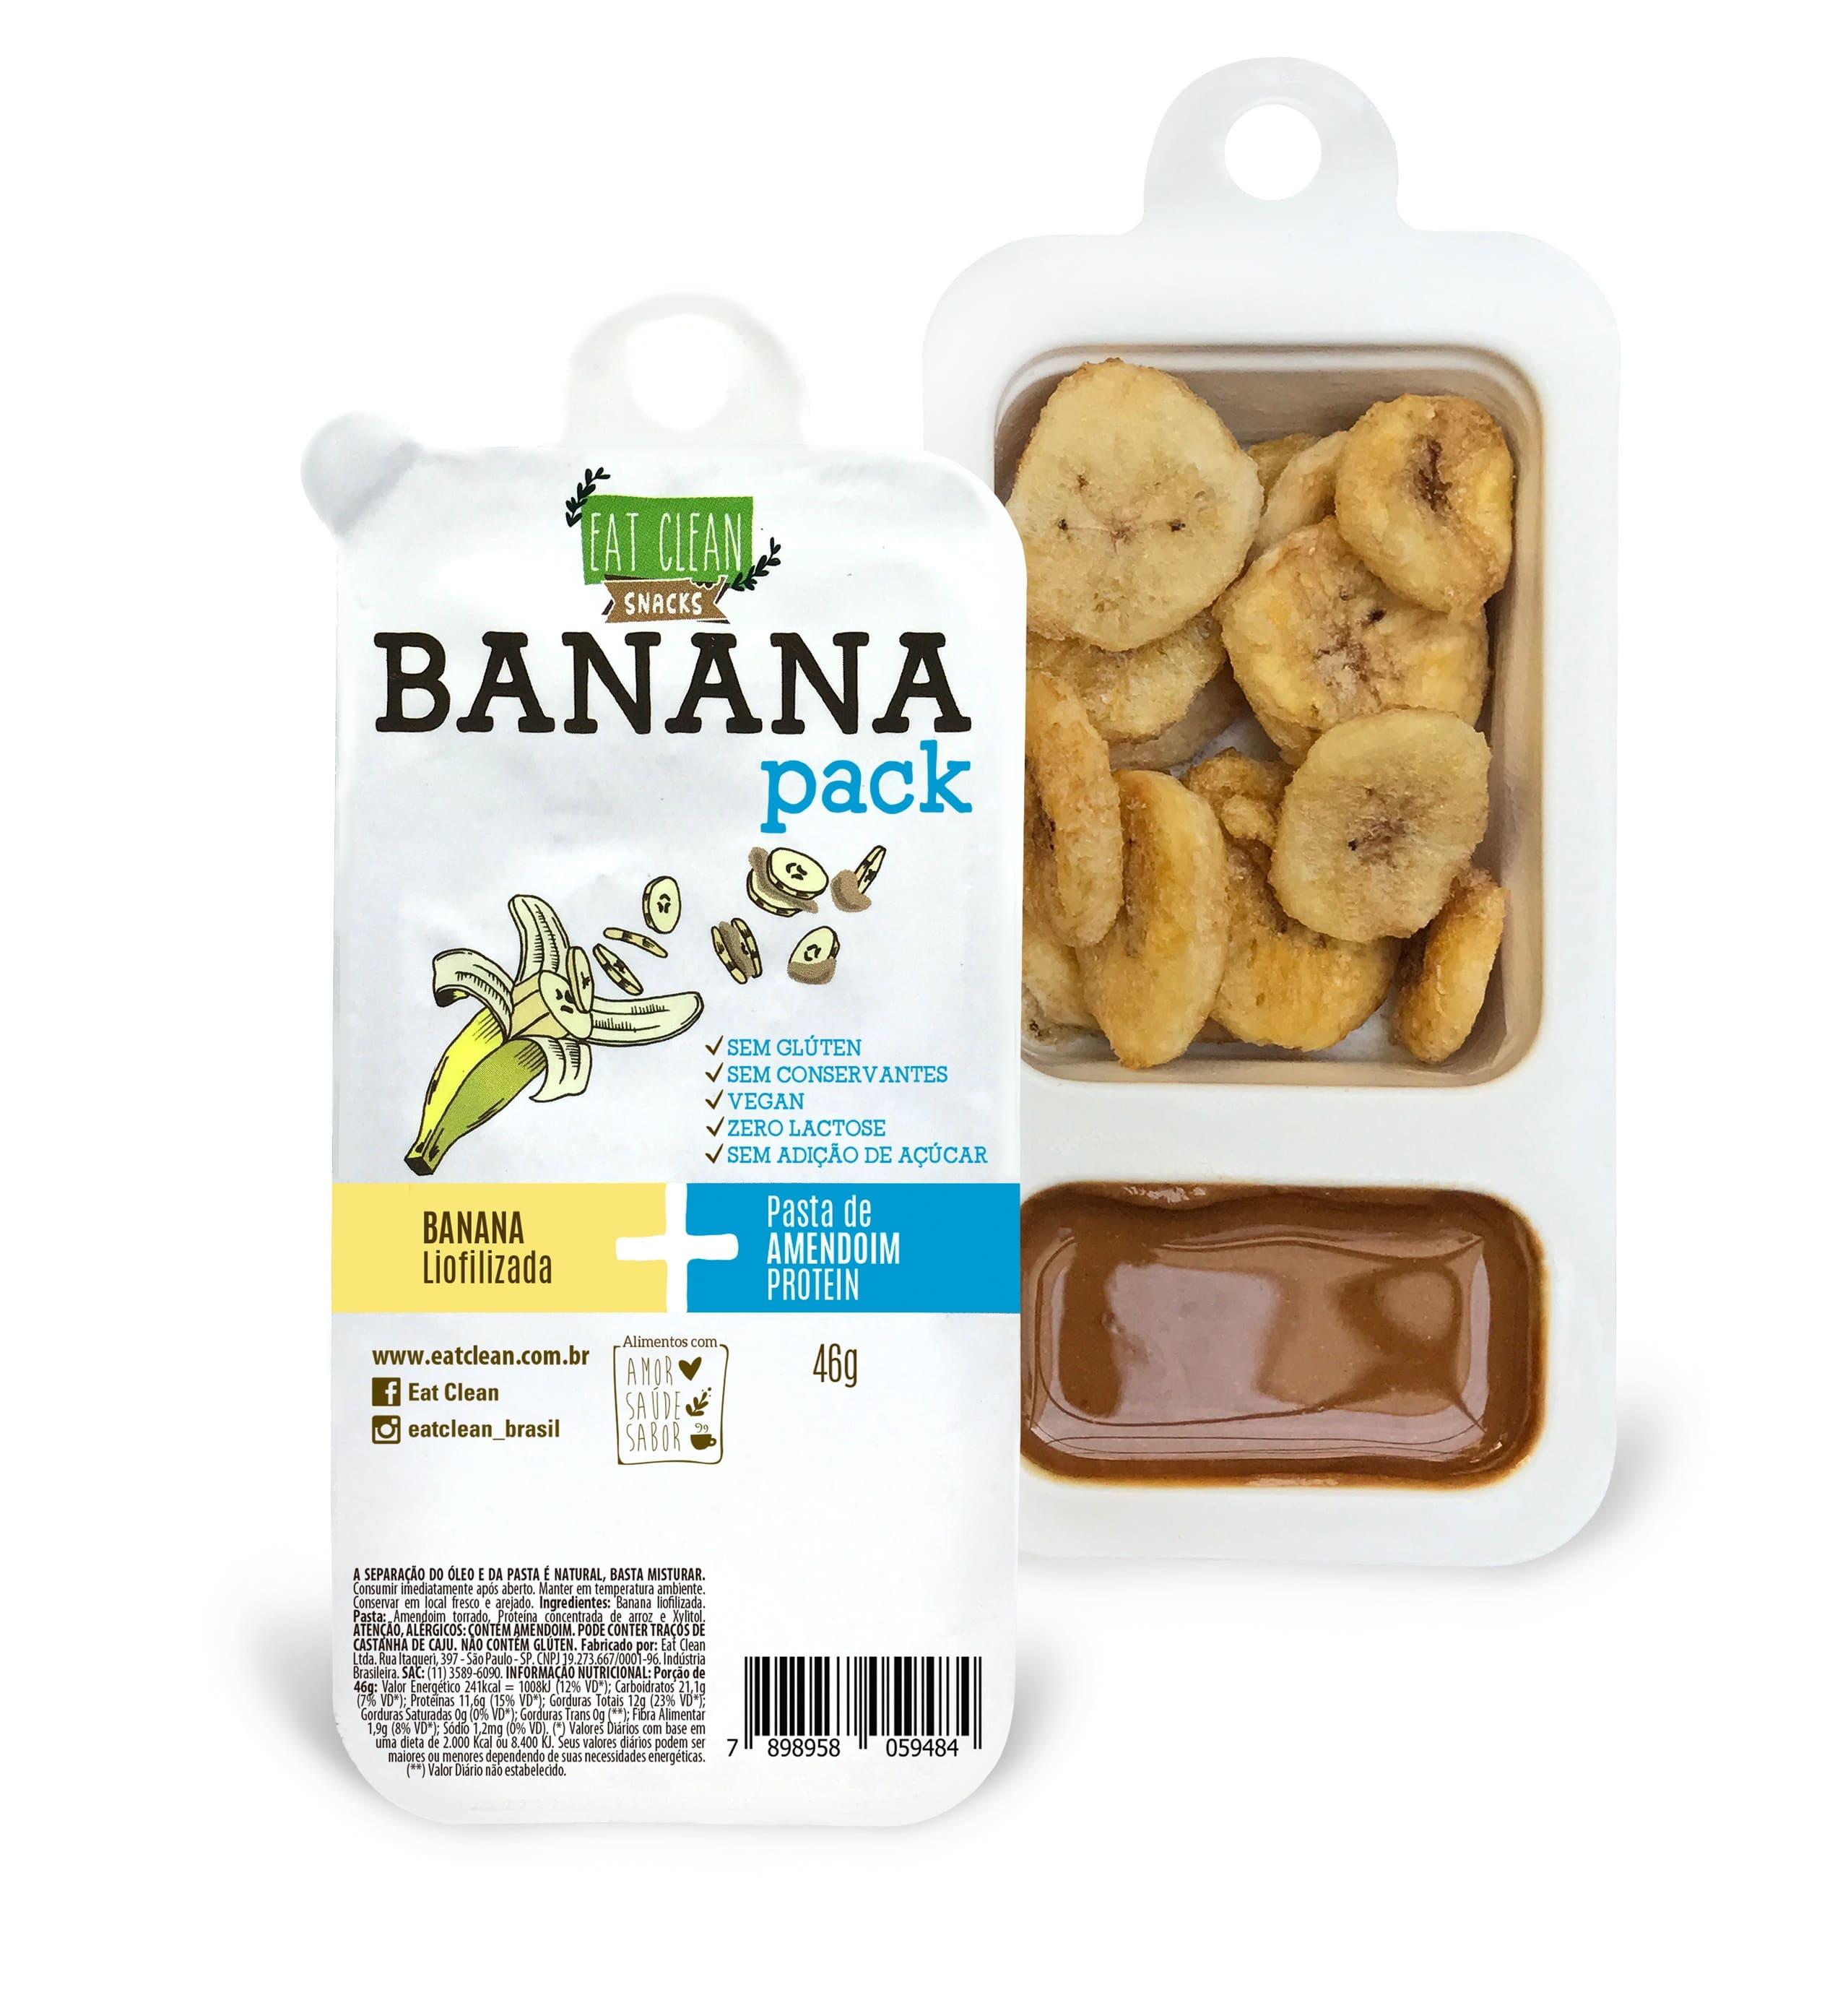 BANANA PACK(banana liofilizda c/pasta amendoim protein) 10x48g(eat clean)